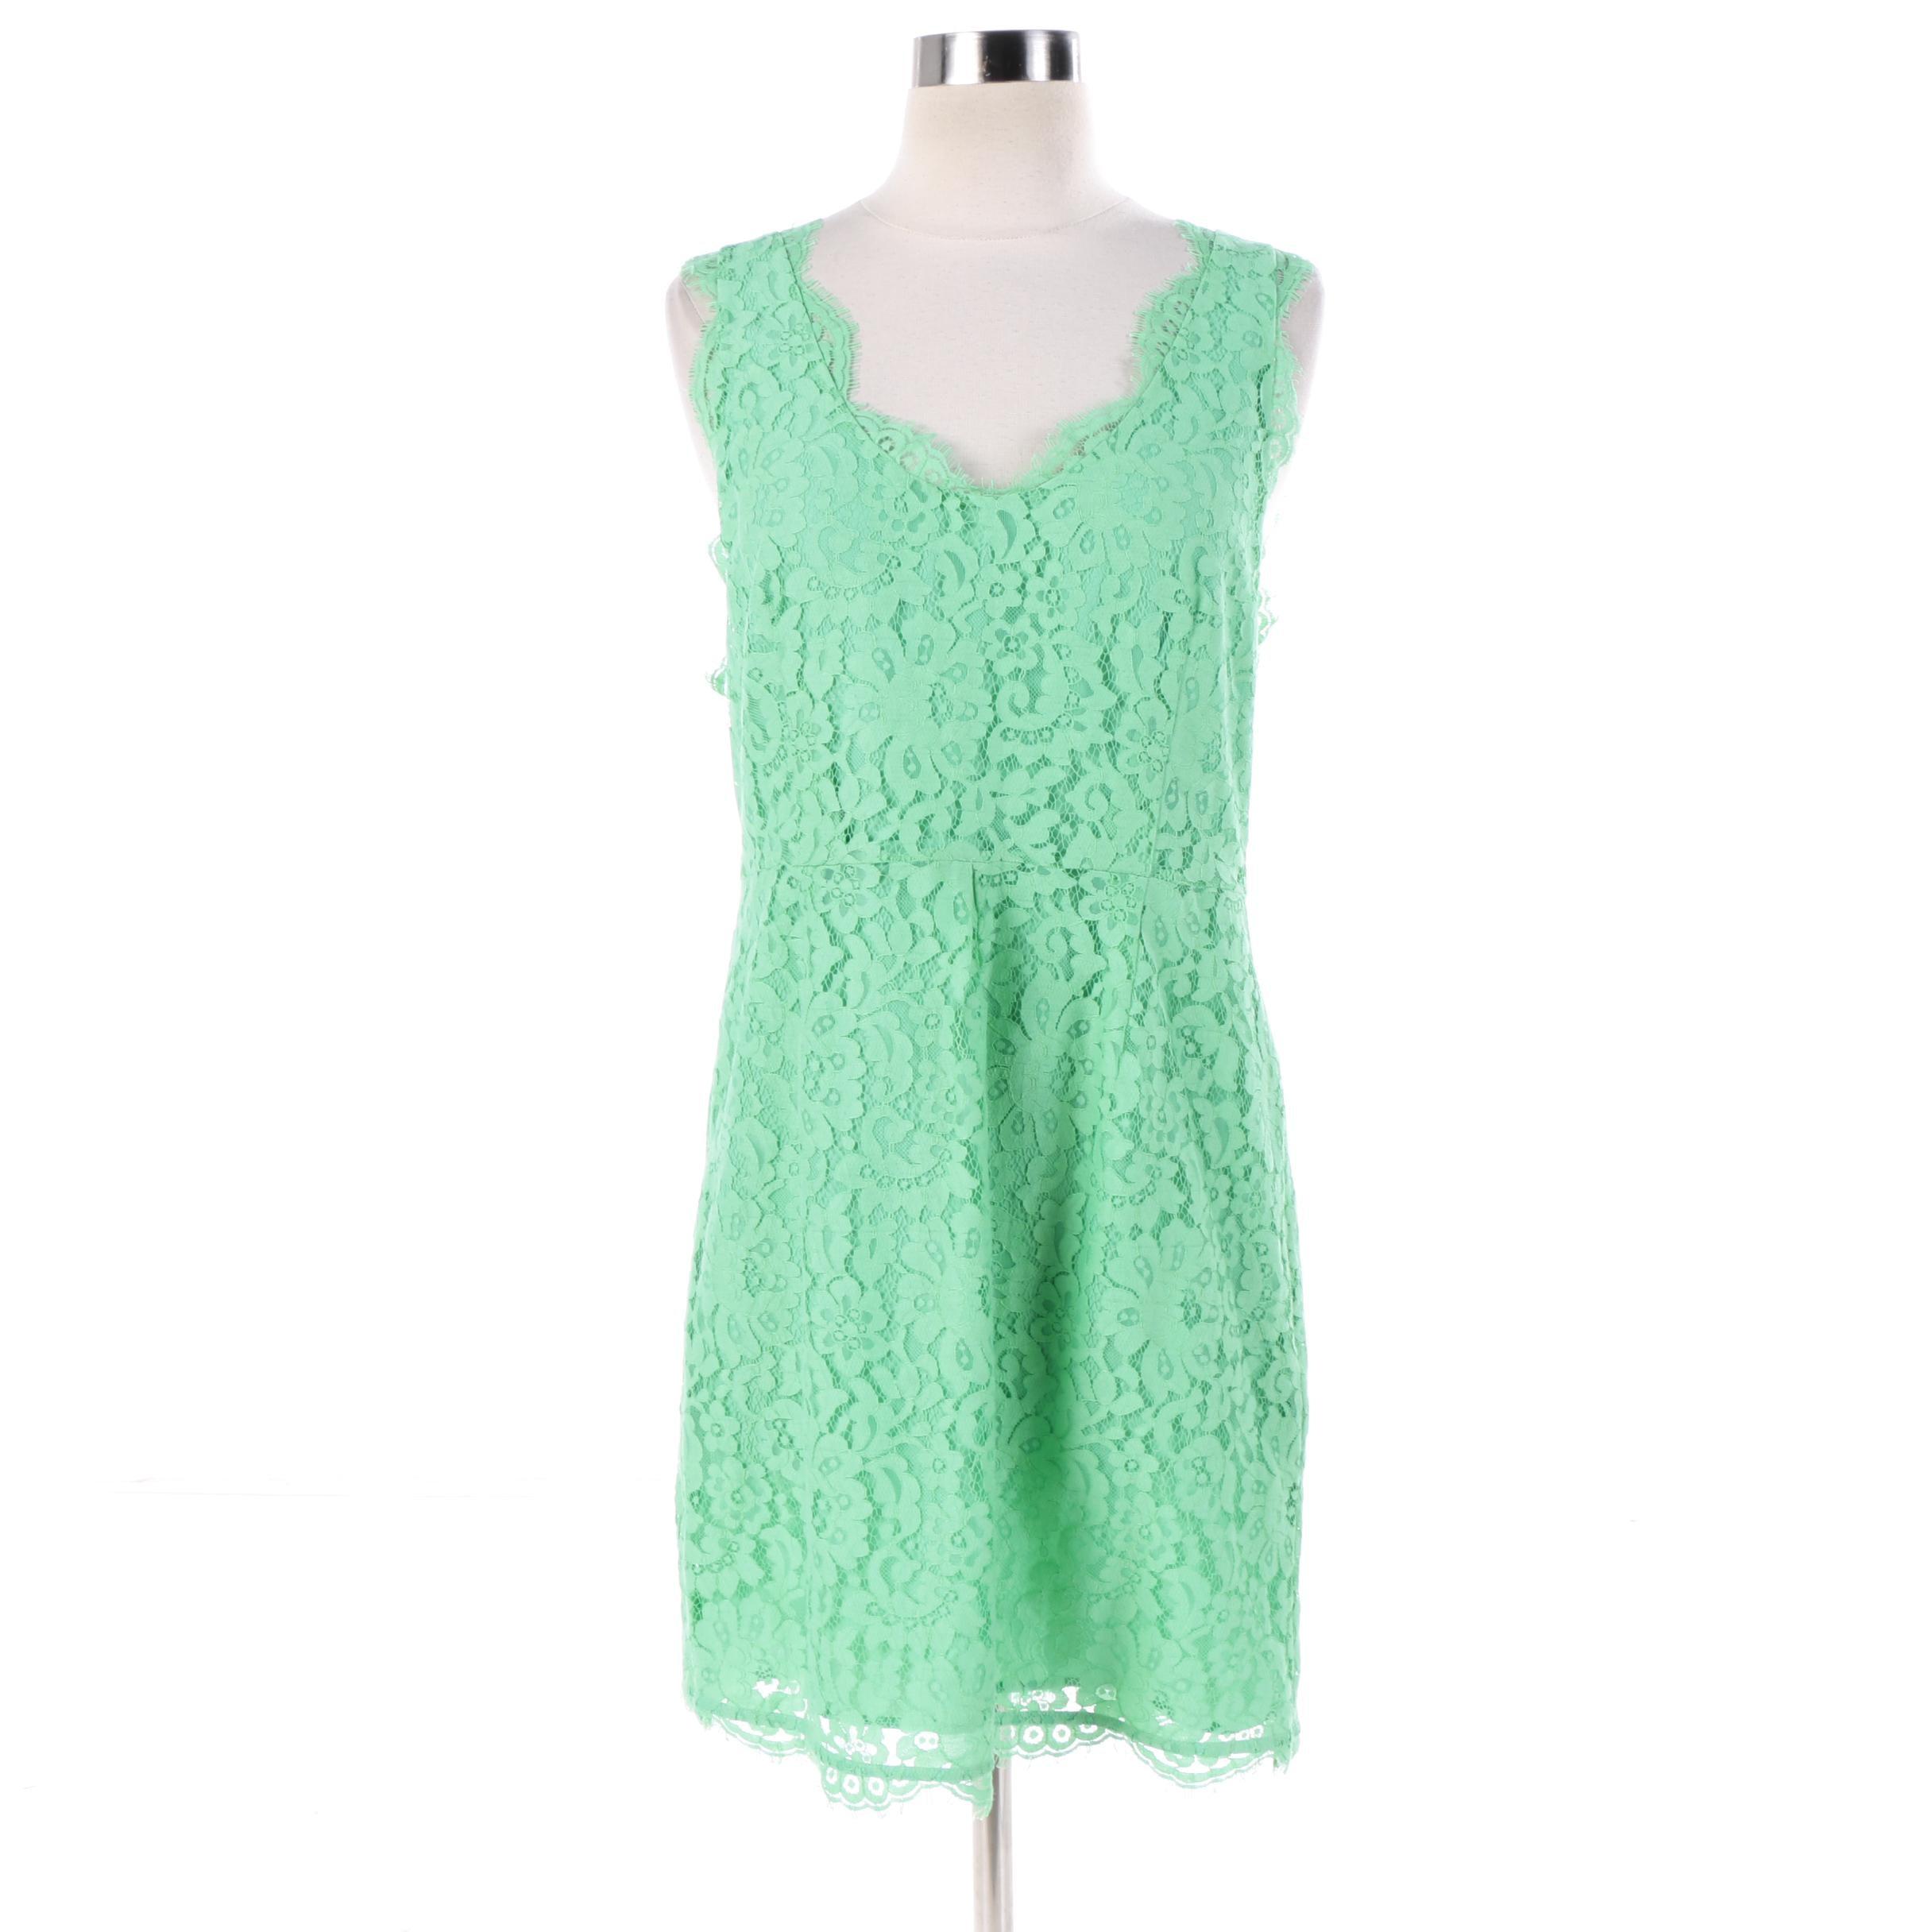 Joie Lace Mint Green Sleeveless Dress